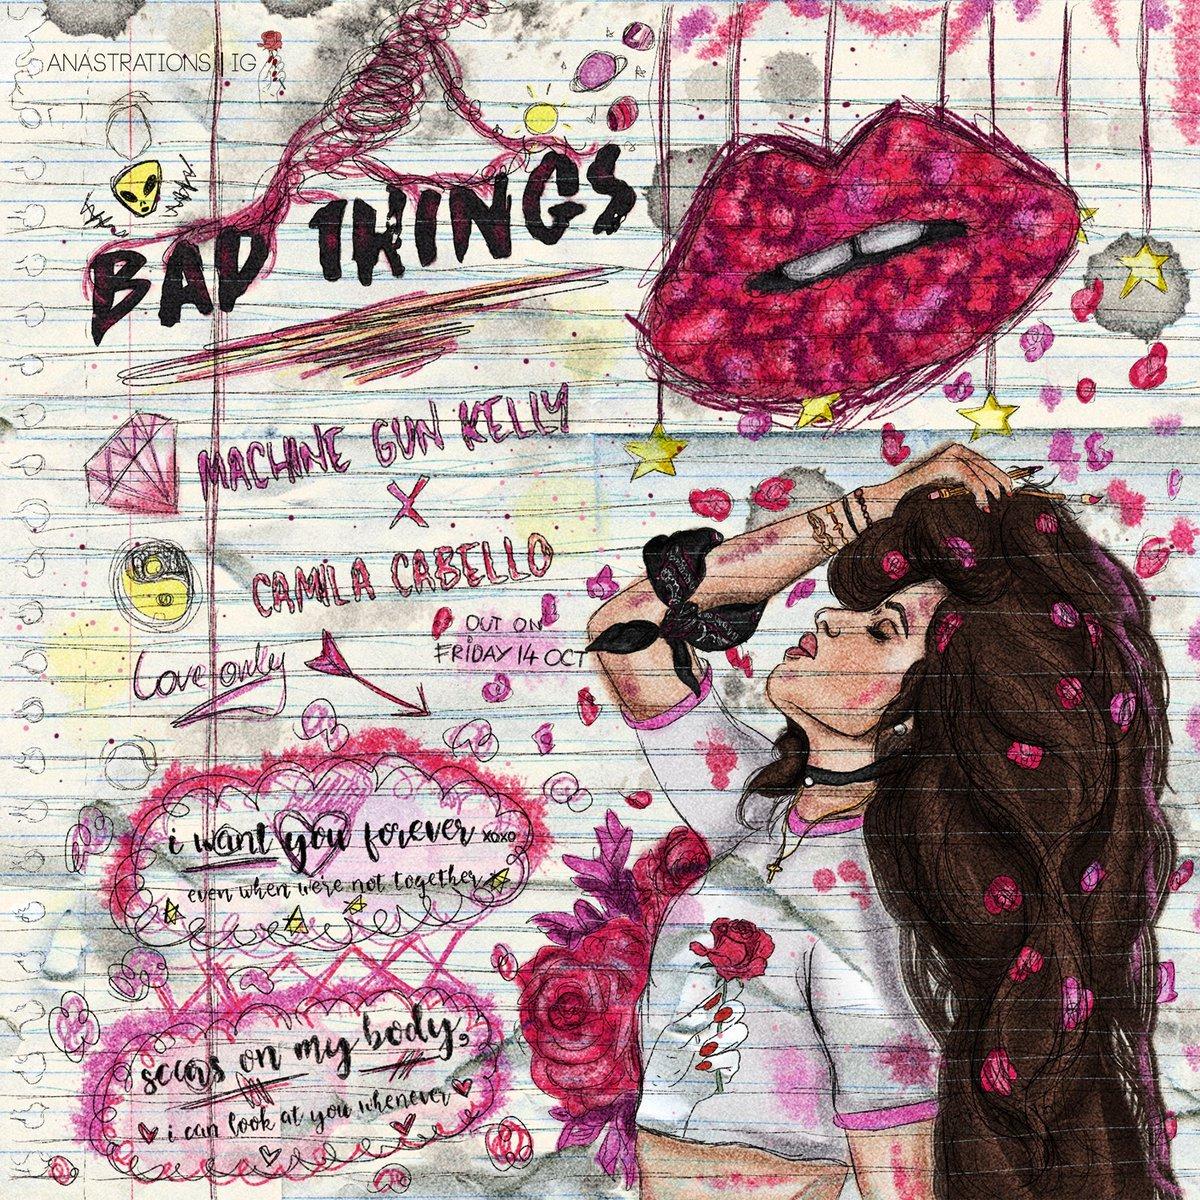 #BadThingsTomorrow: Bad Things Tomorrow